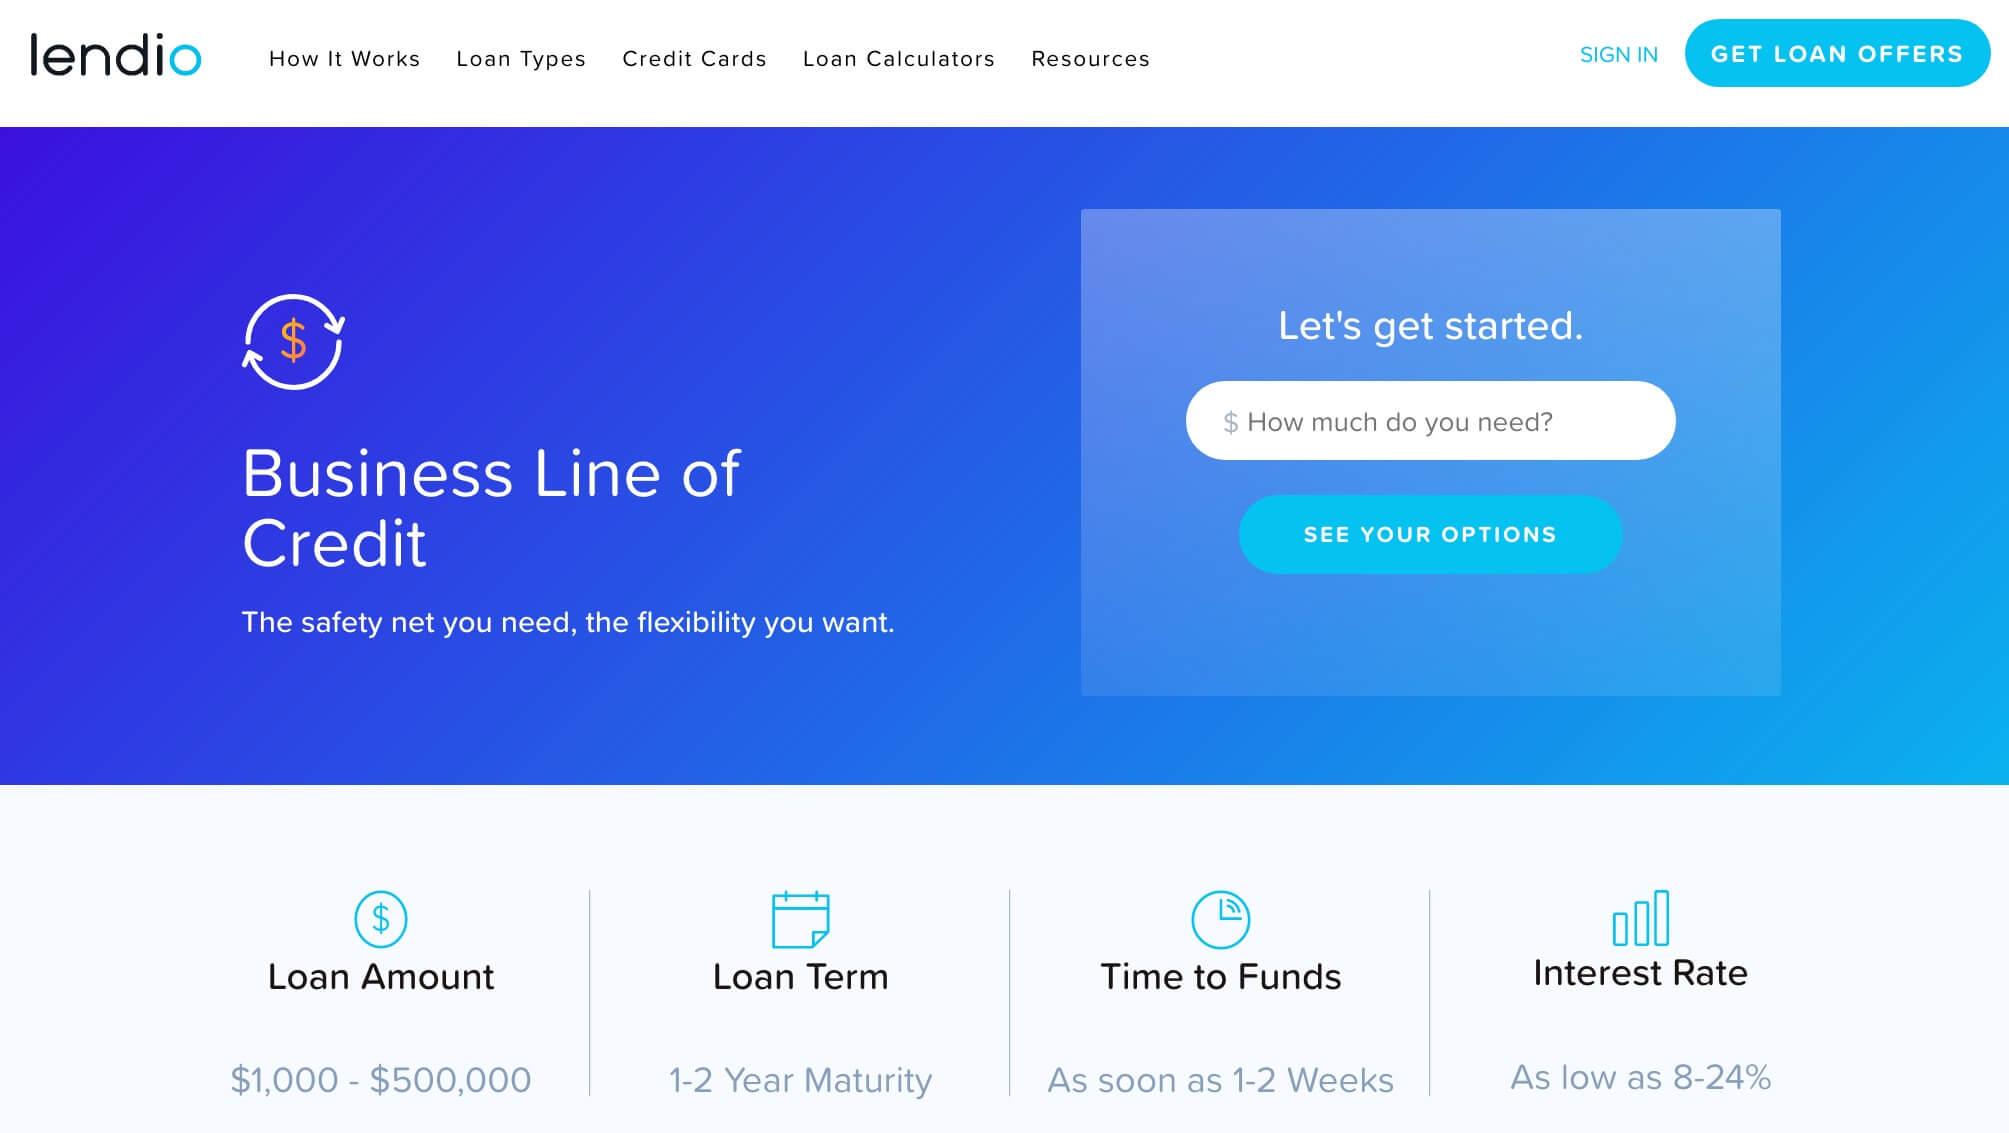 Lendio business line of credit